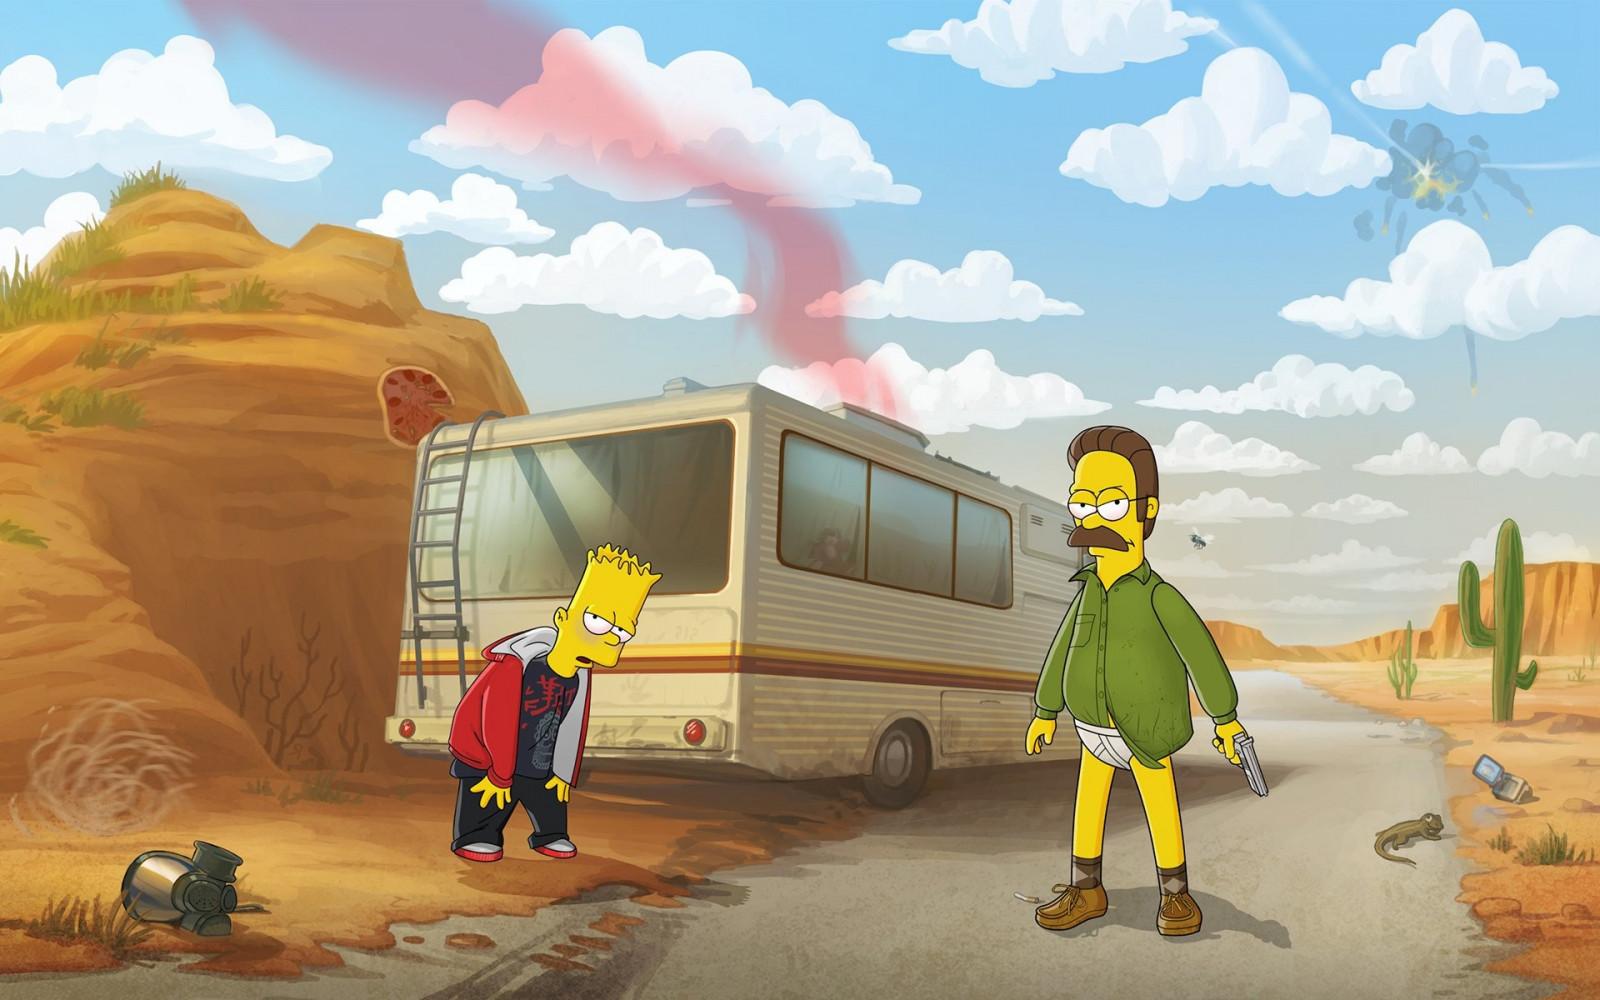 Wallpaper 1920x1200 Px Bart Simpson Breaking Bad